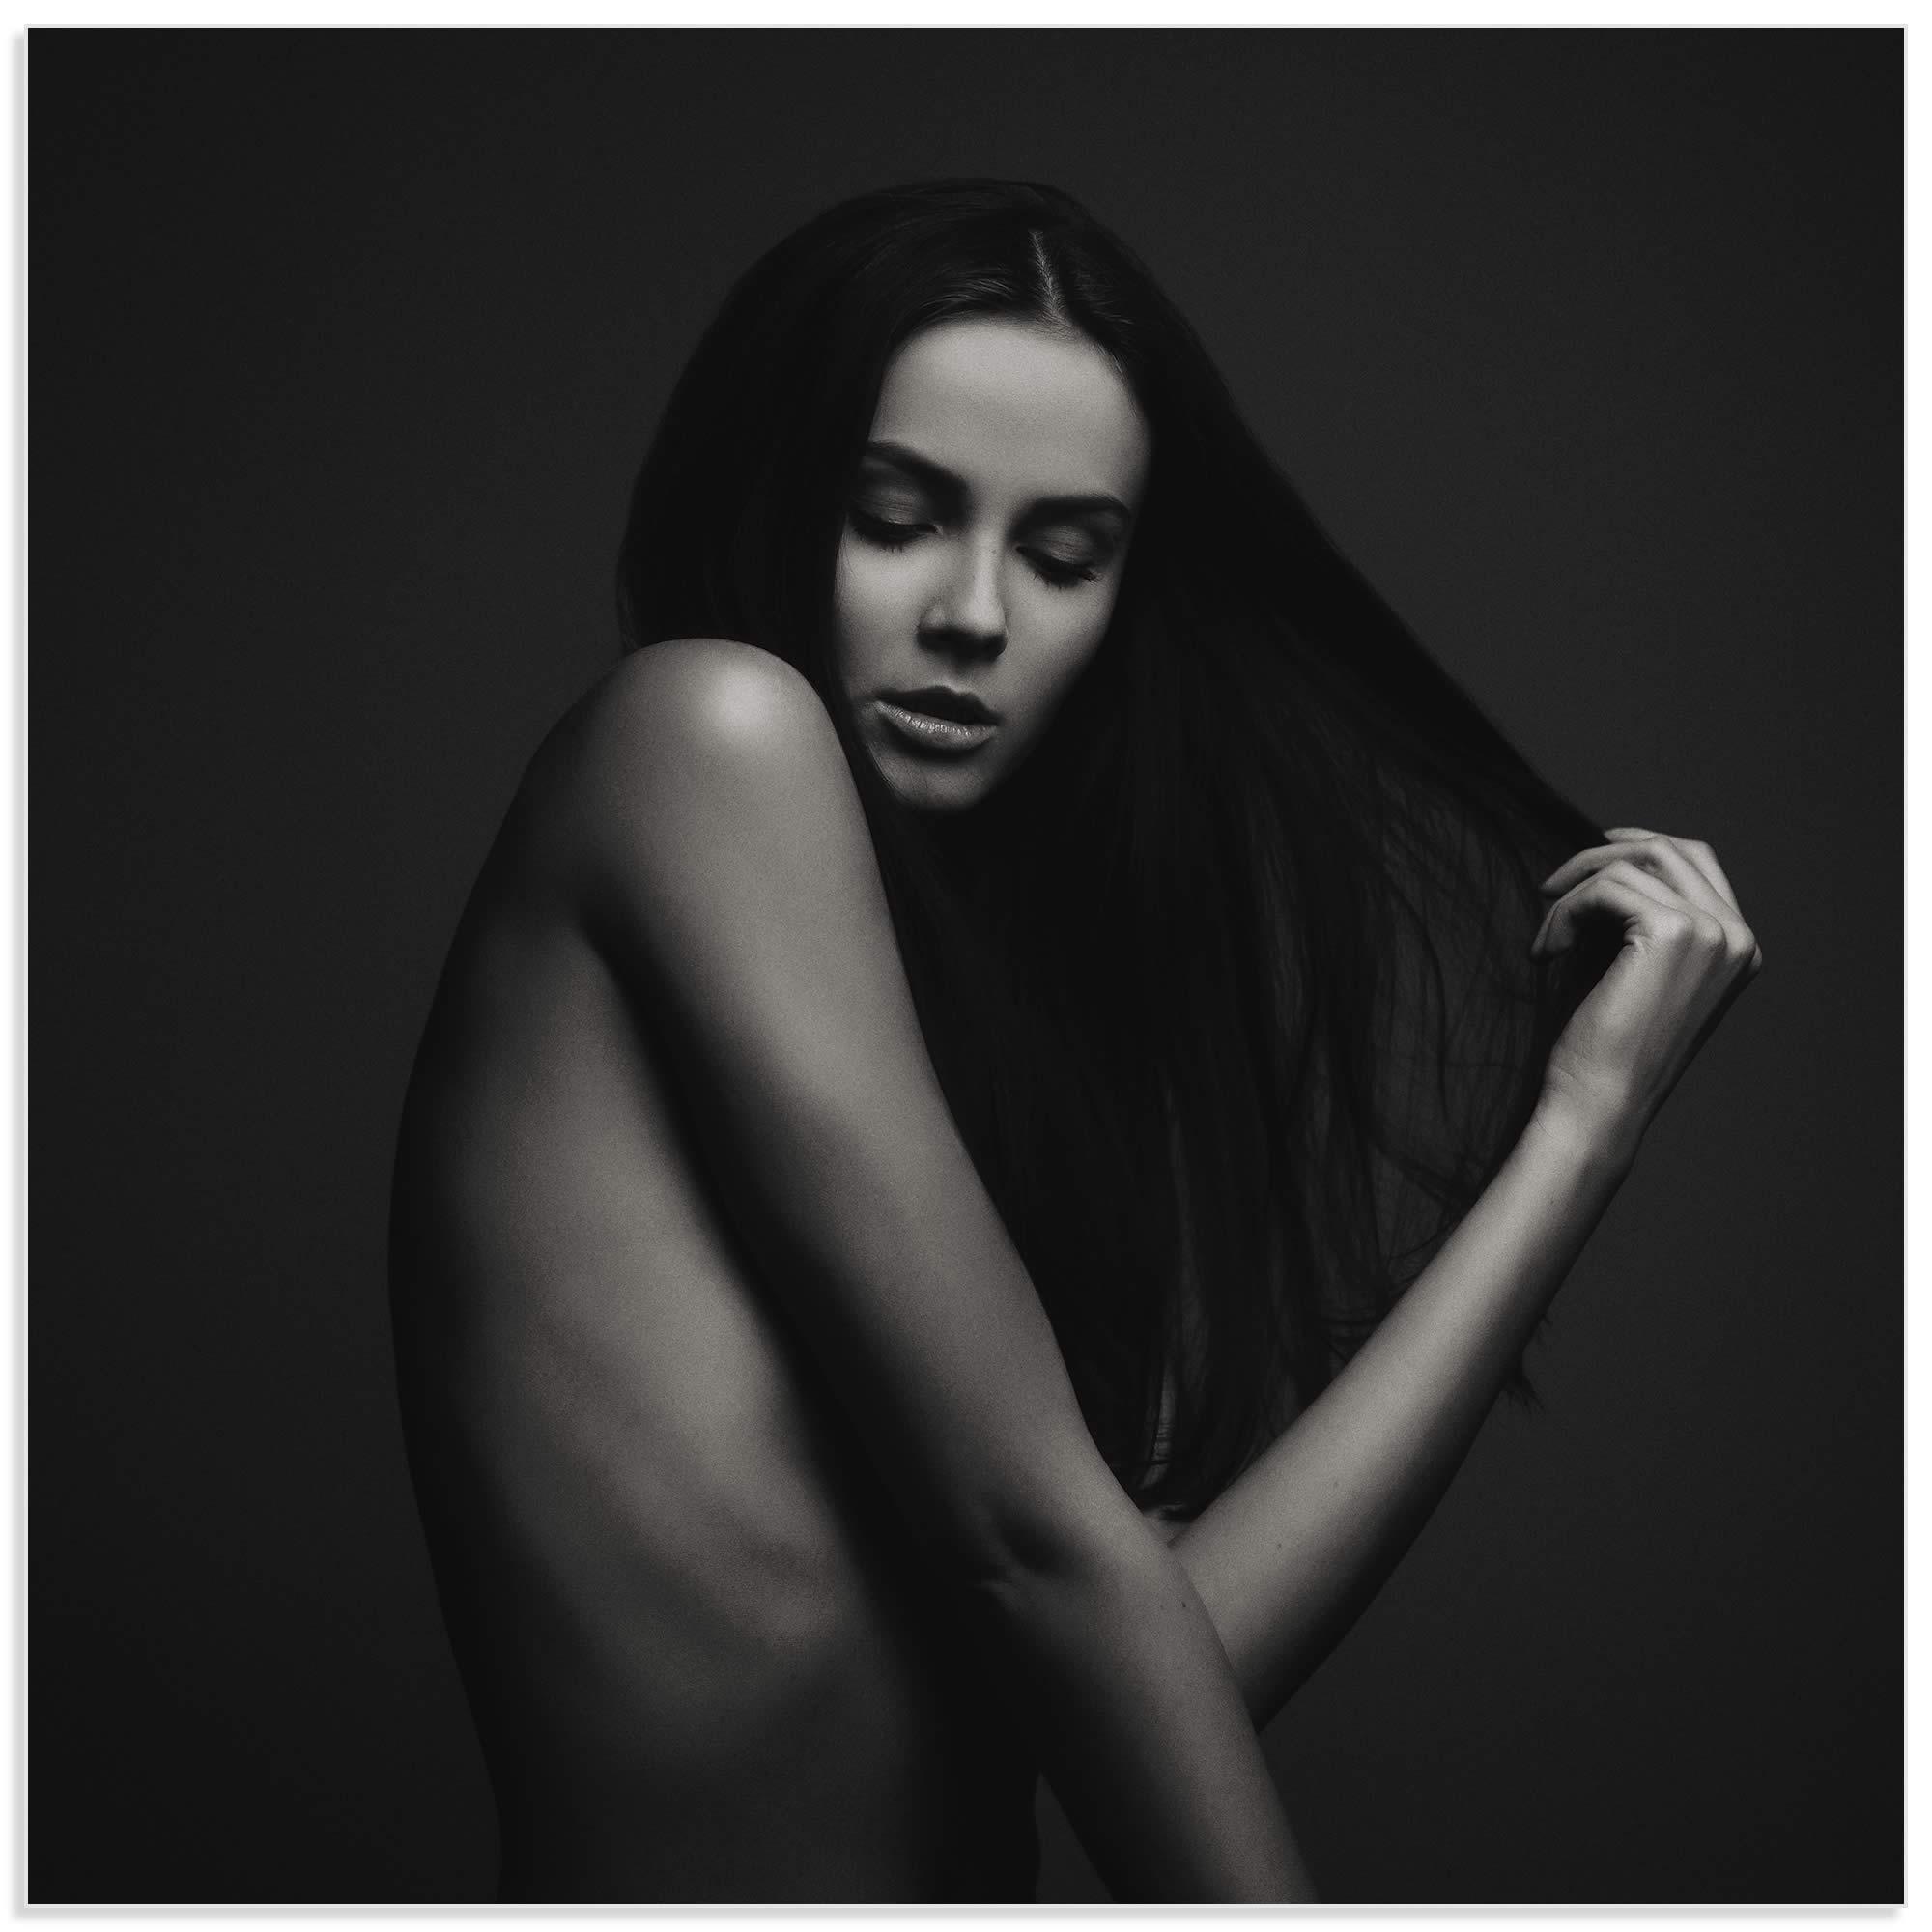 Miriama by Martin Krystynek - Model Photography on Metal or Acrylic - Alternate View 2